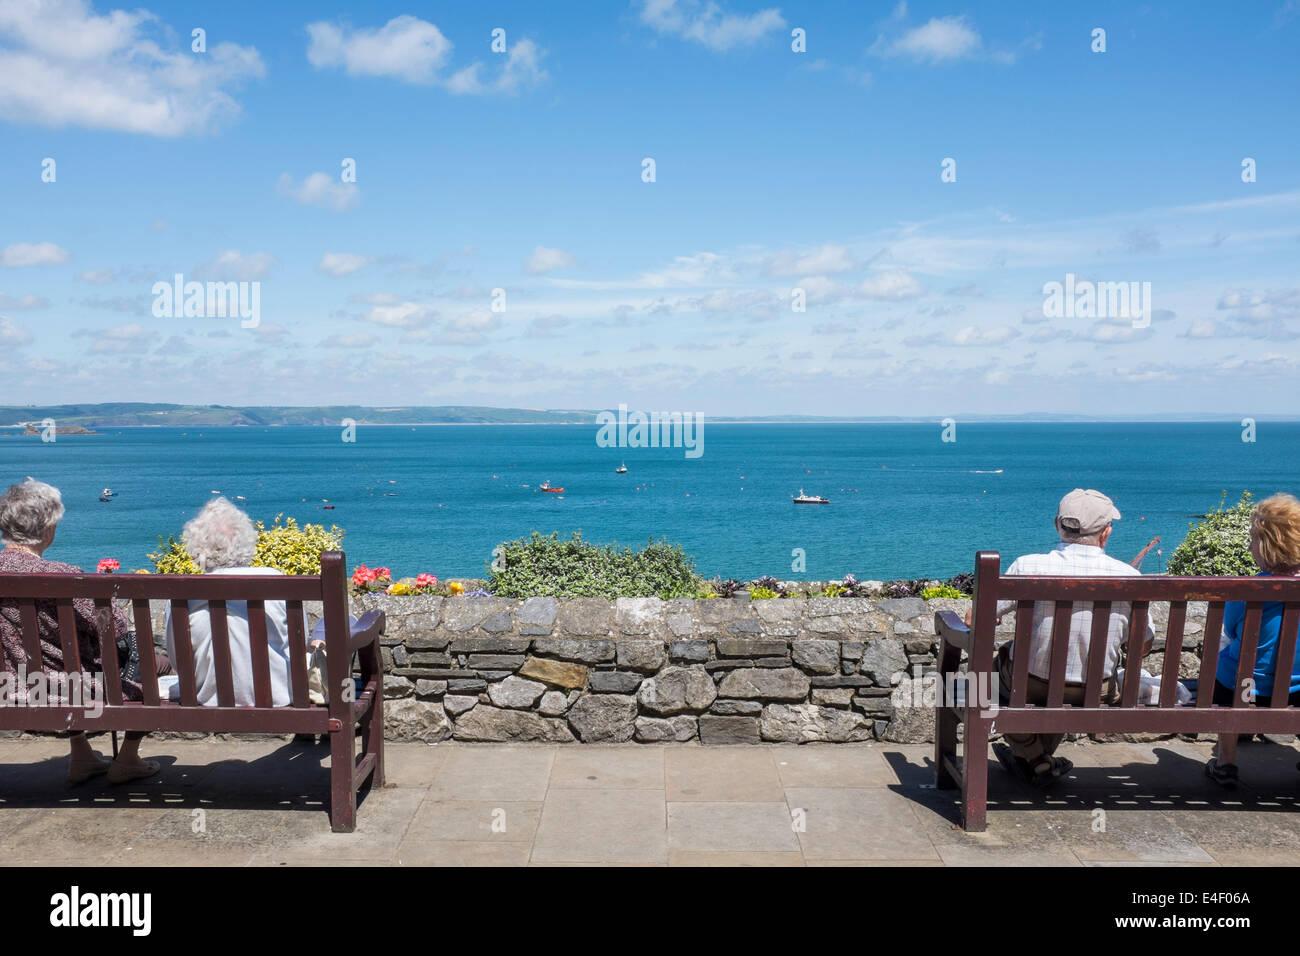 Old people enjoying retirement in Tenby - Stock Image